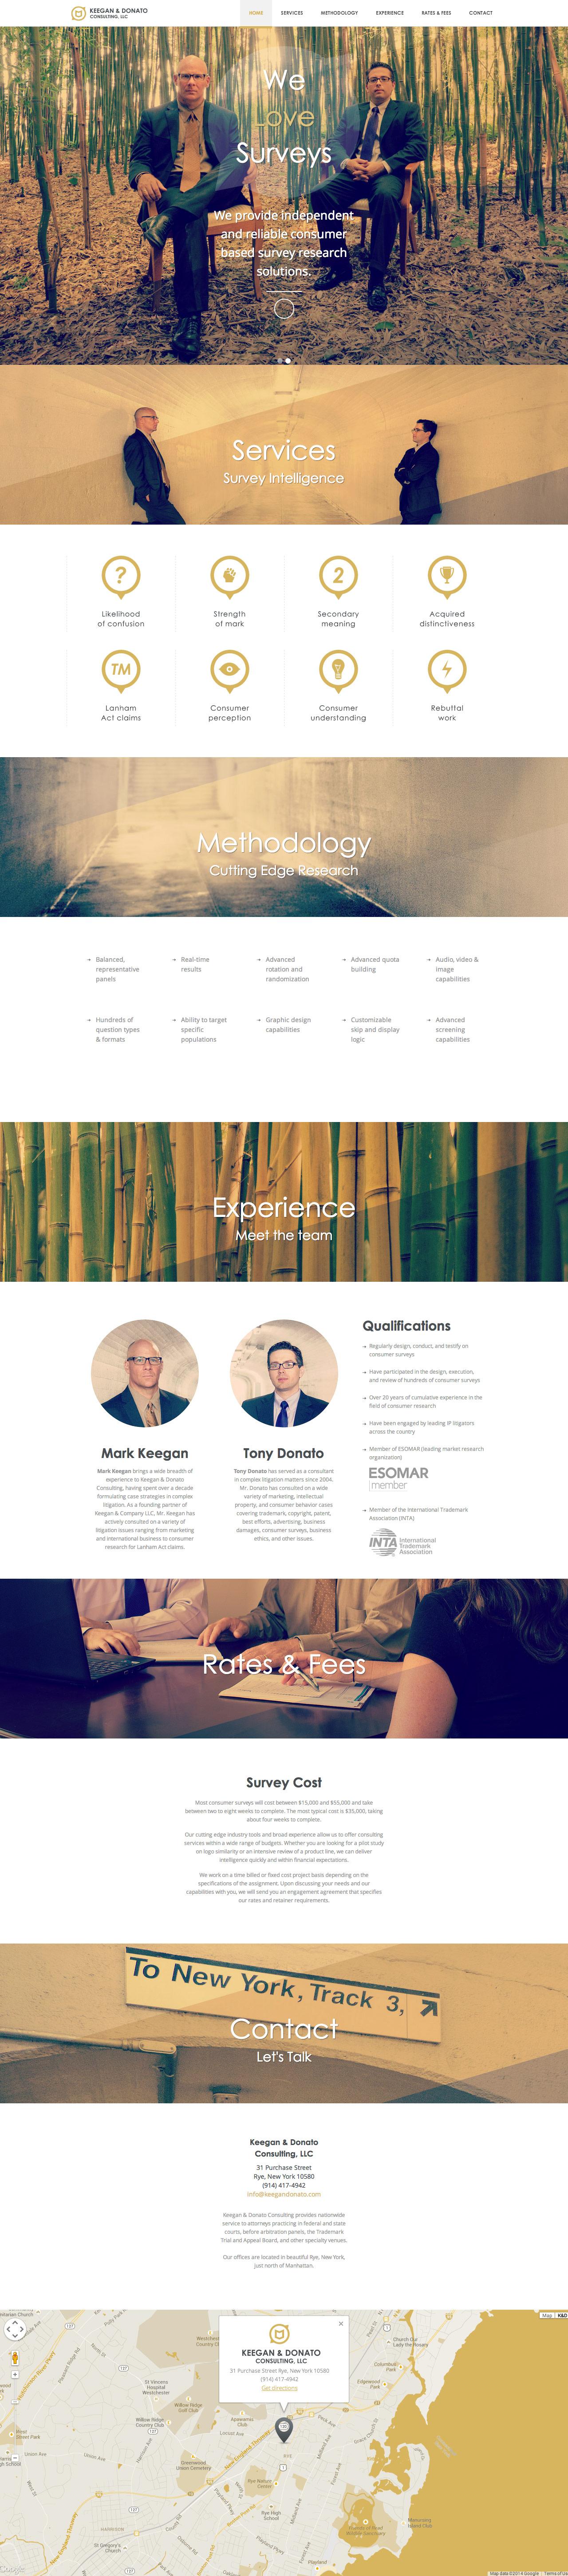 Keegan & Donato Website Screenshot